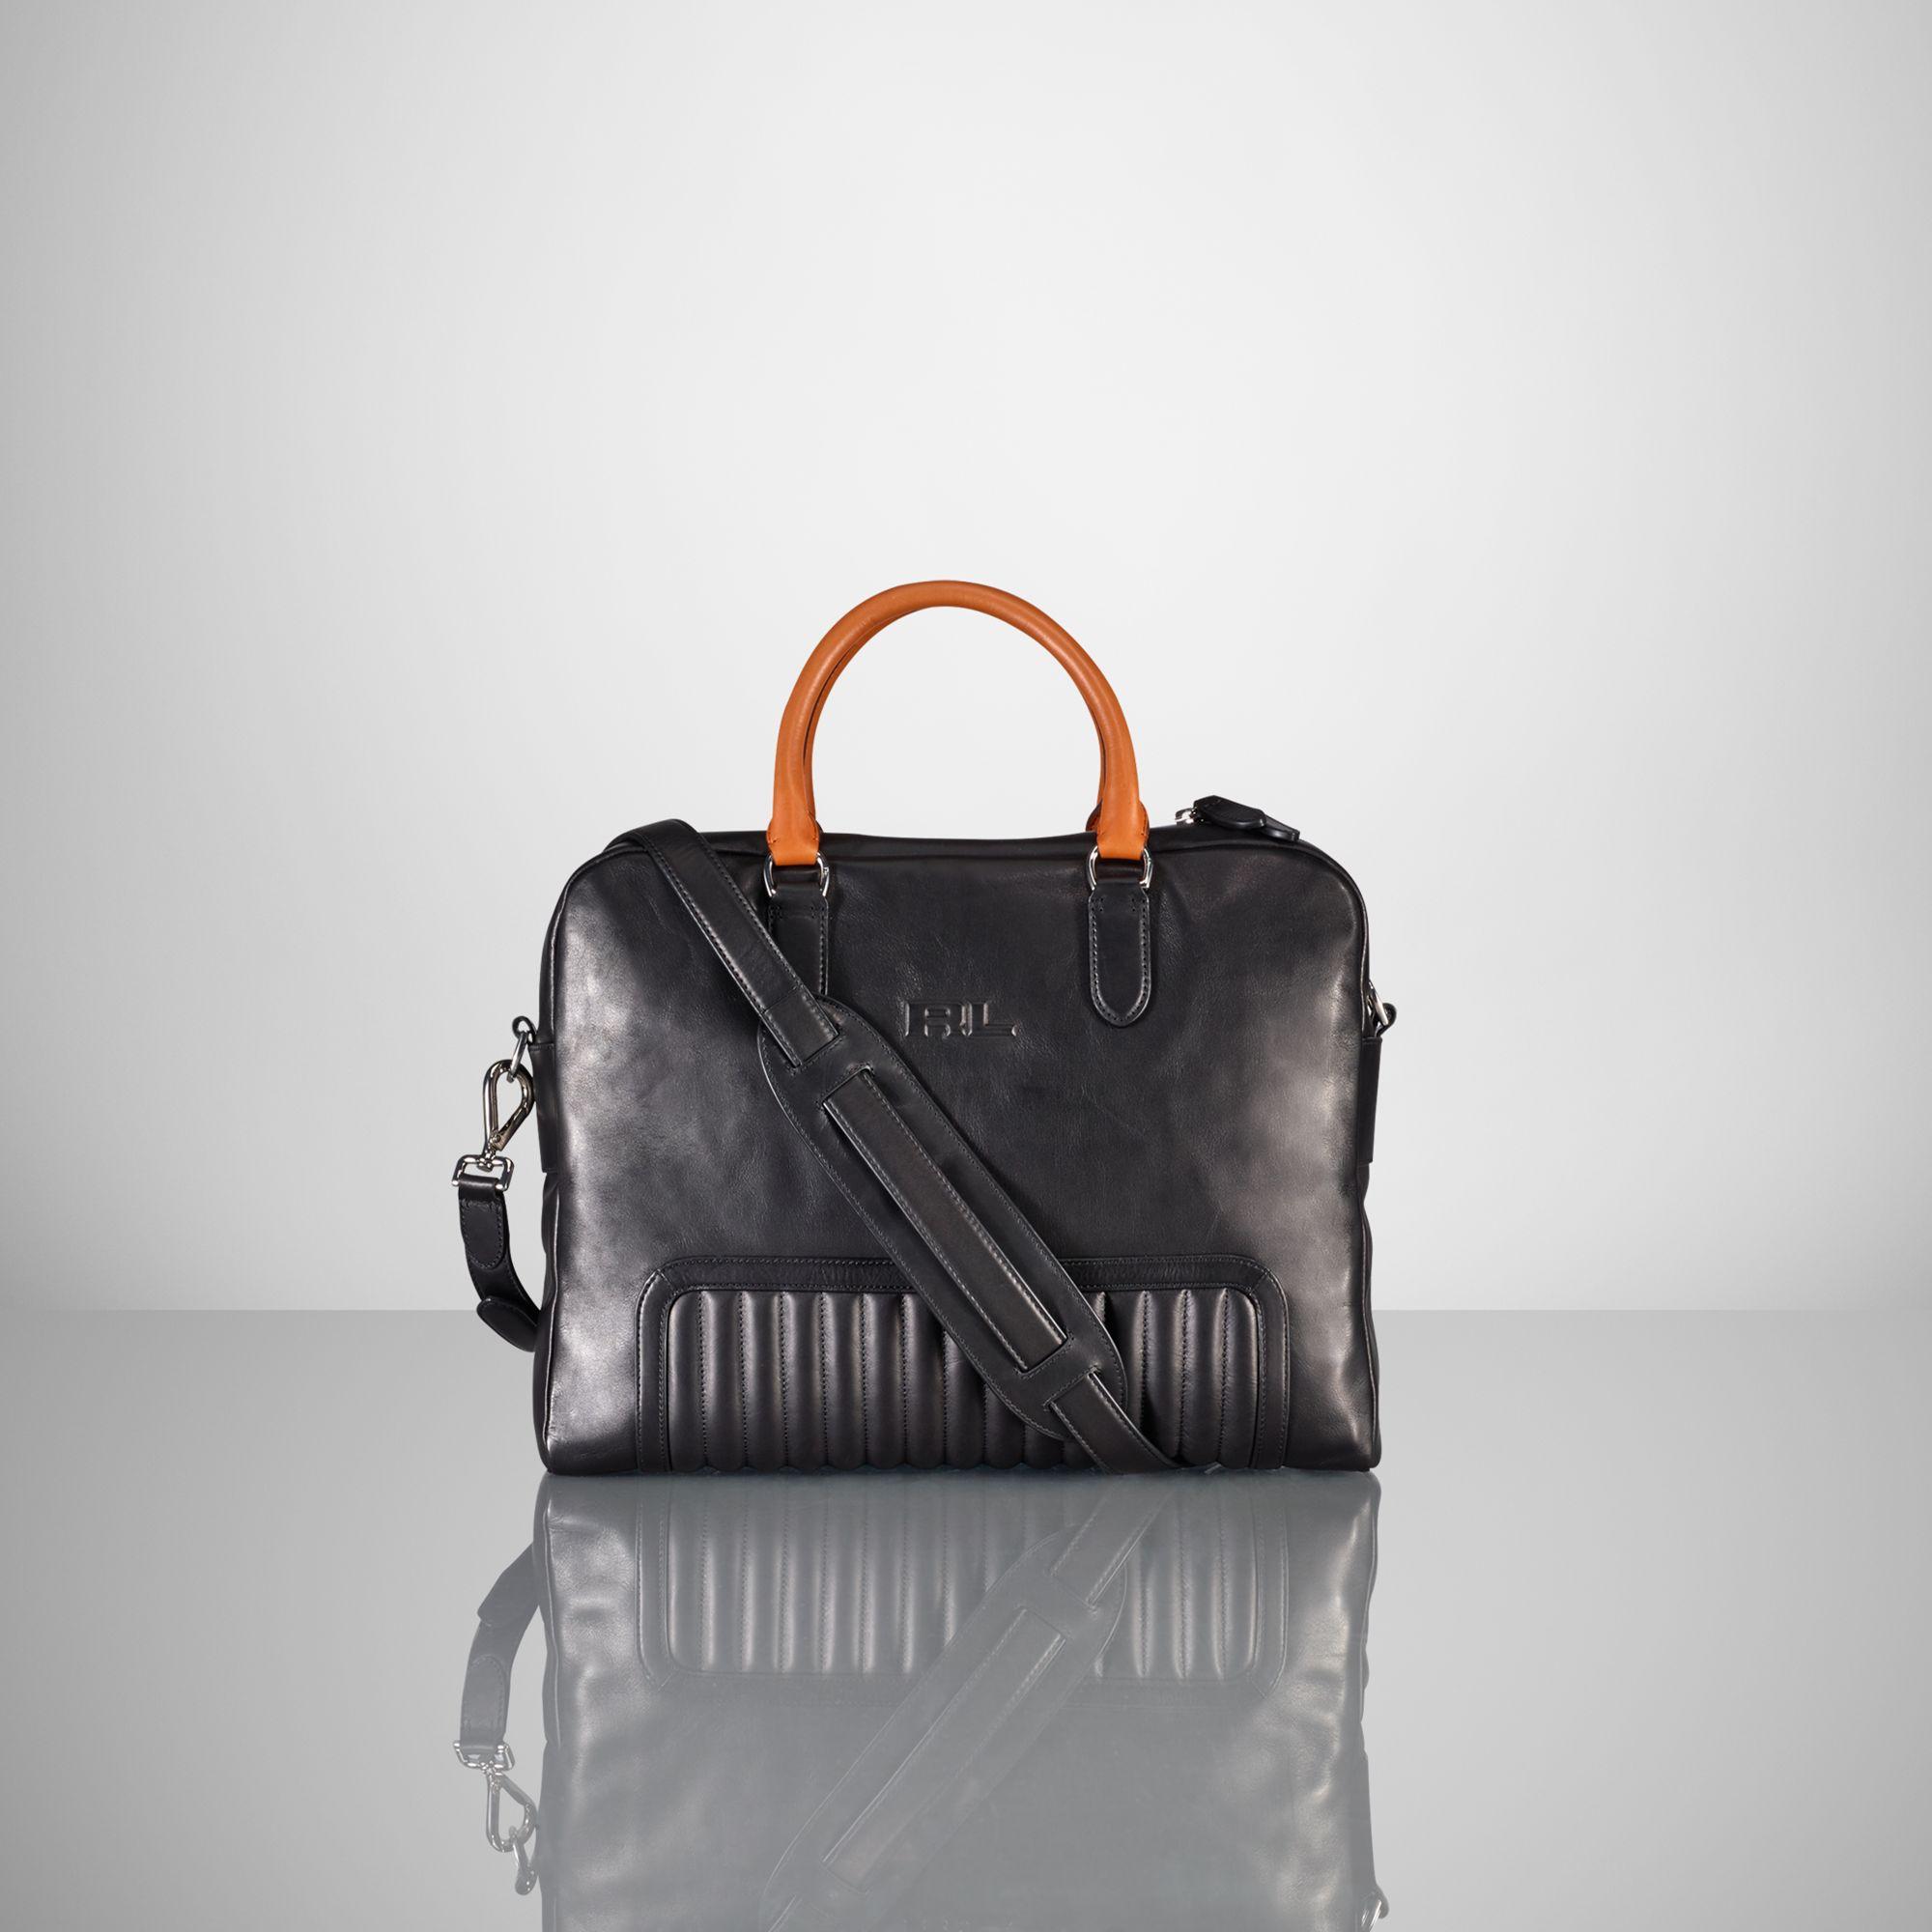 a18240c97511 Ralph Lauren Quilted Calfskin Briefcase in Black for Men - Lyst